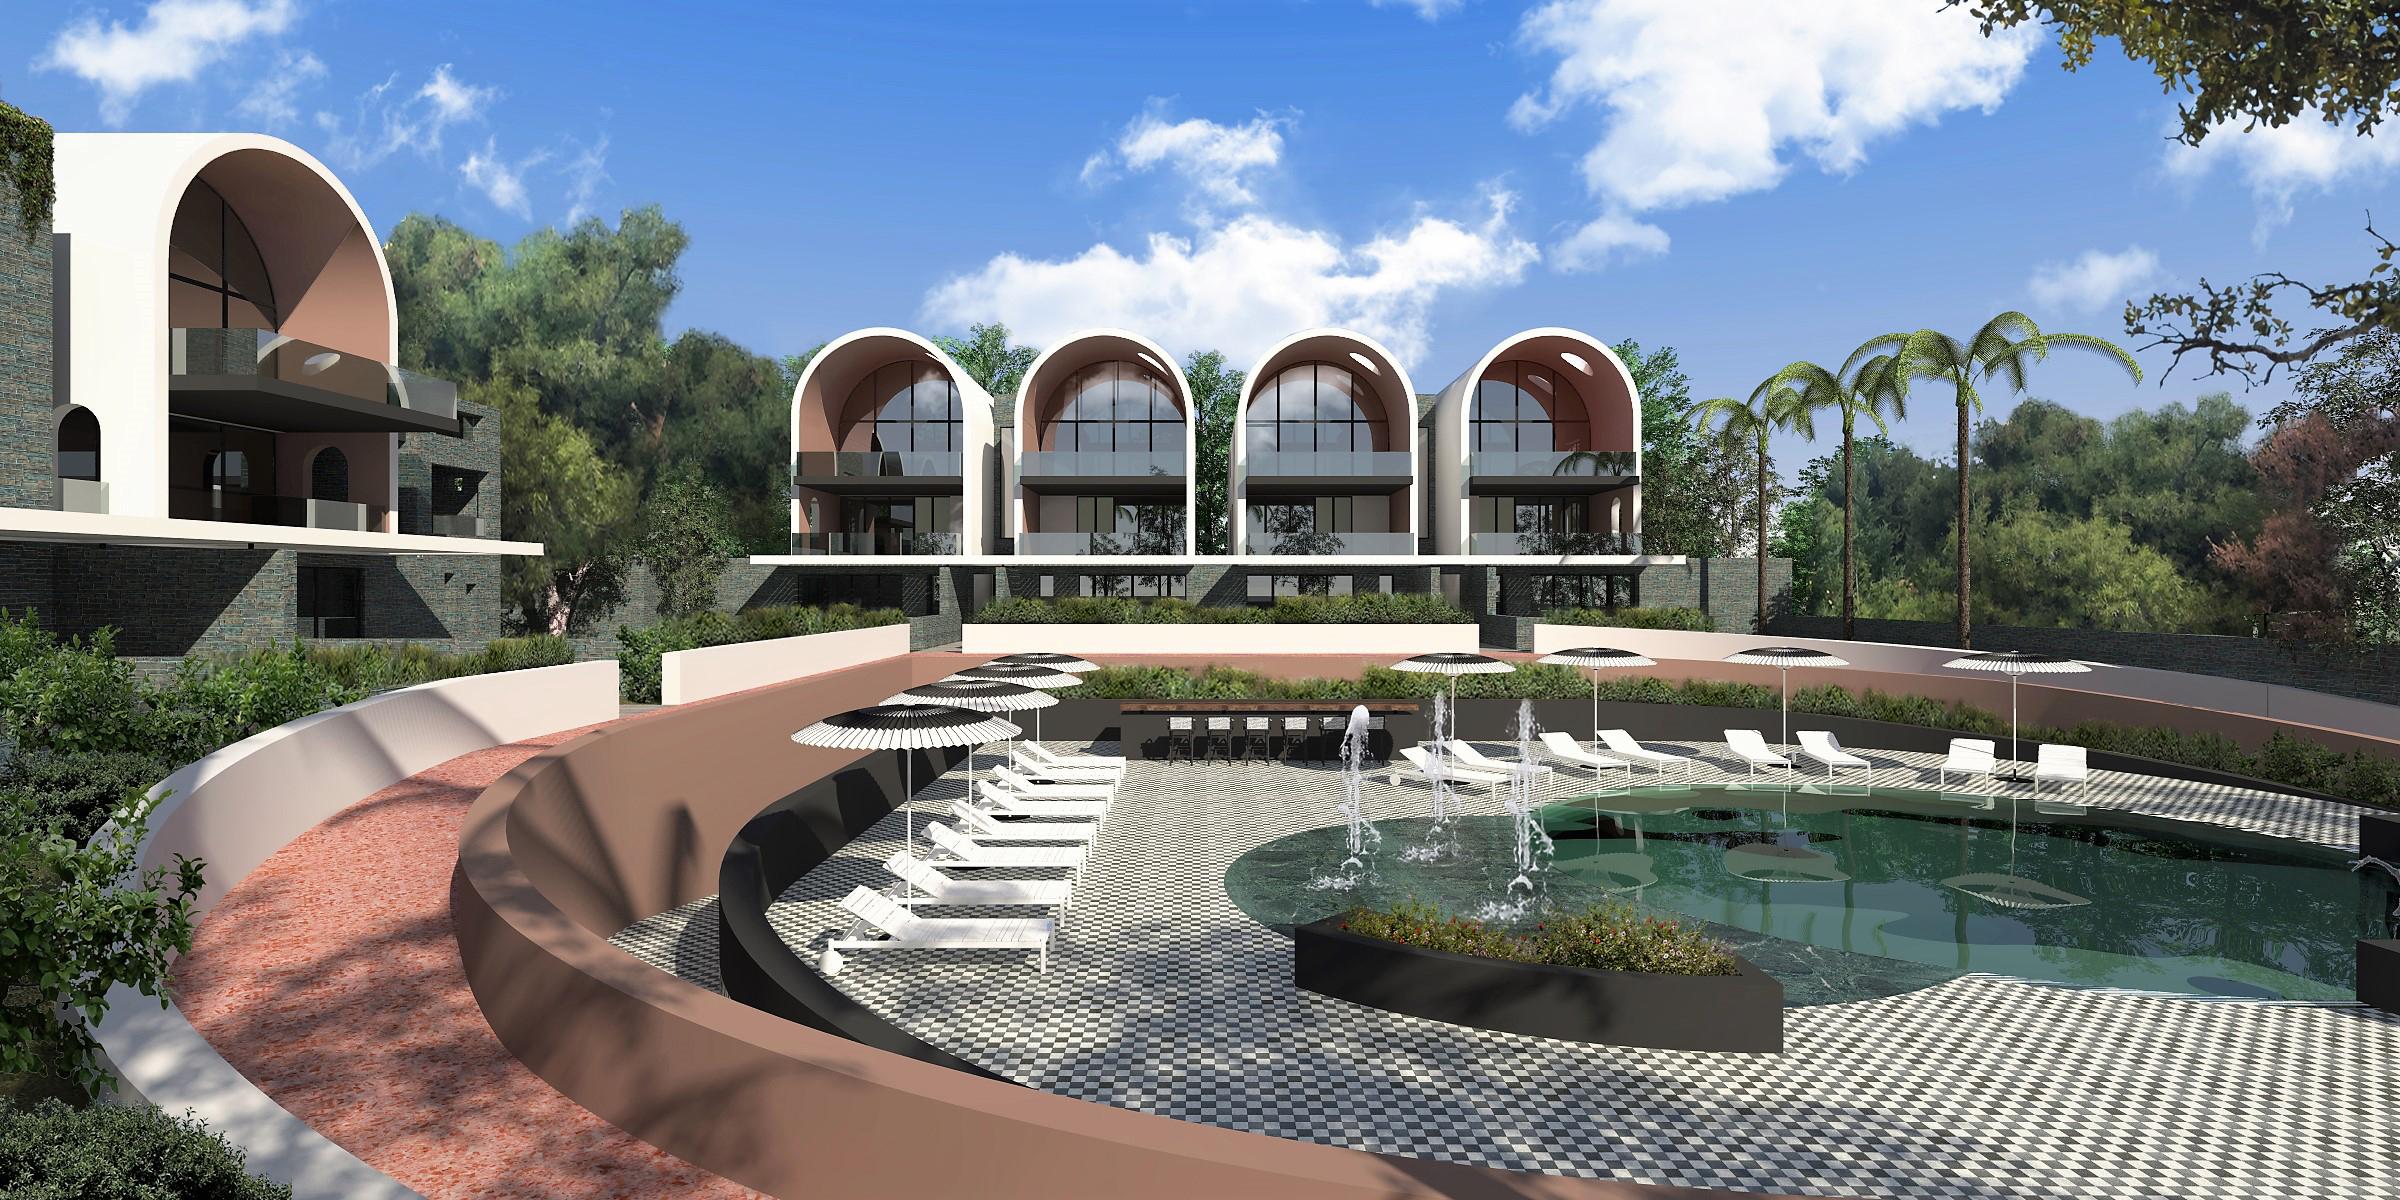 """Mirage"" Housing complex, Vouliagmeni, Greece"